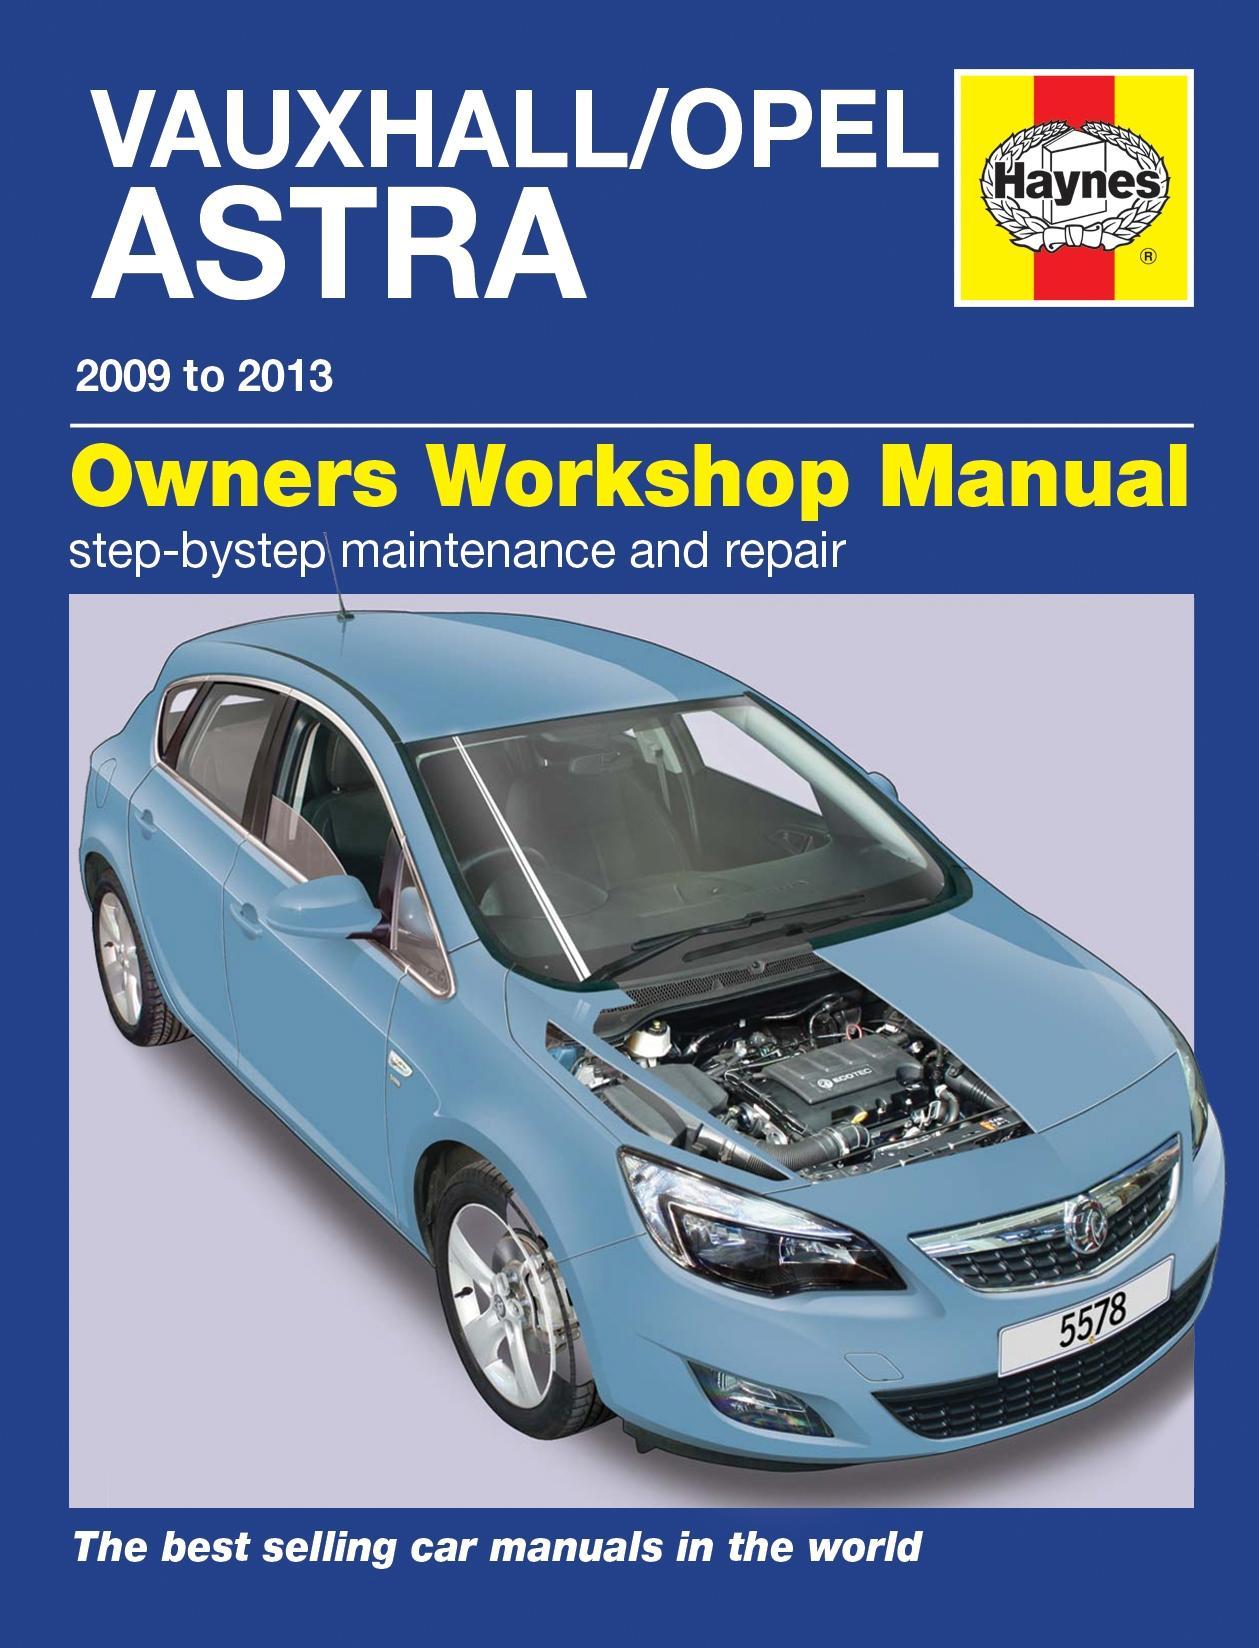 haynes owners workshop manual vauxhall opel astra 2009 2013 rh ebay co uk Craftsman Garage Door Opener Manual Professional Workshop Manuals